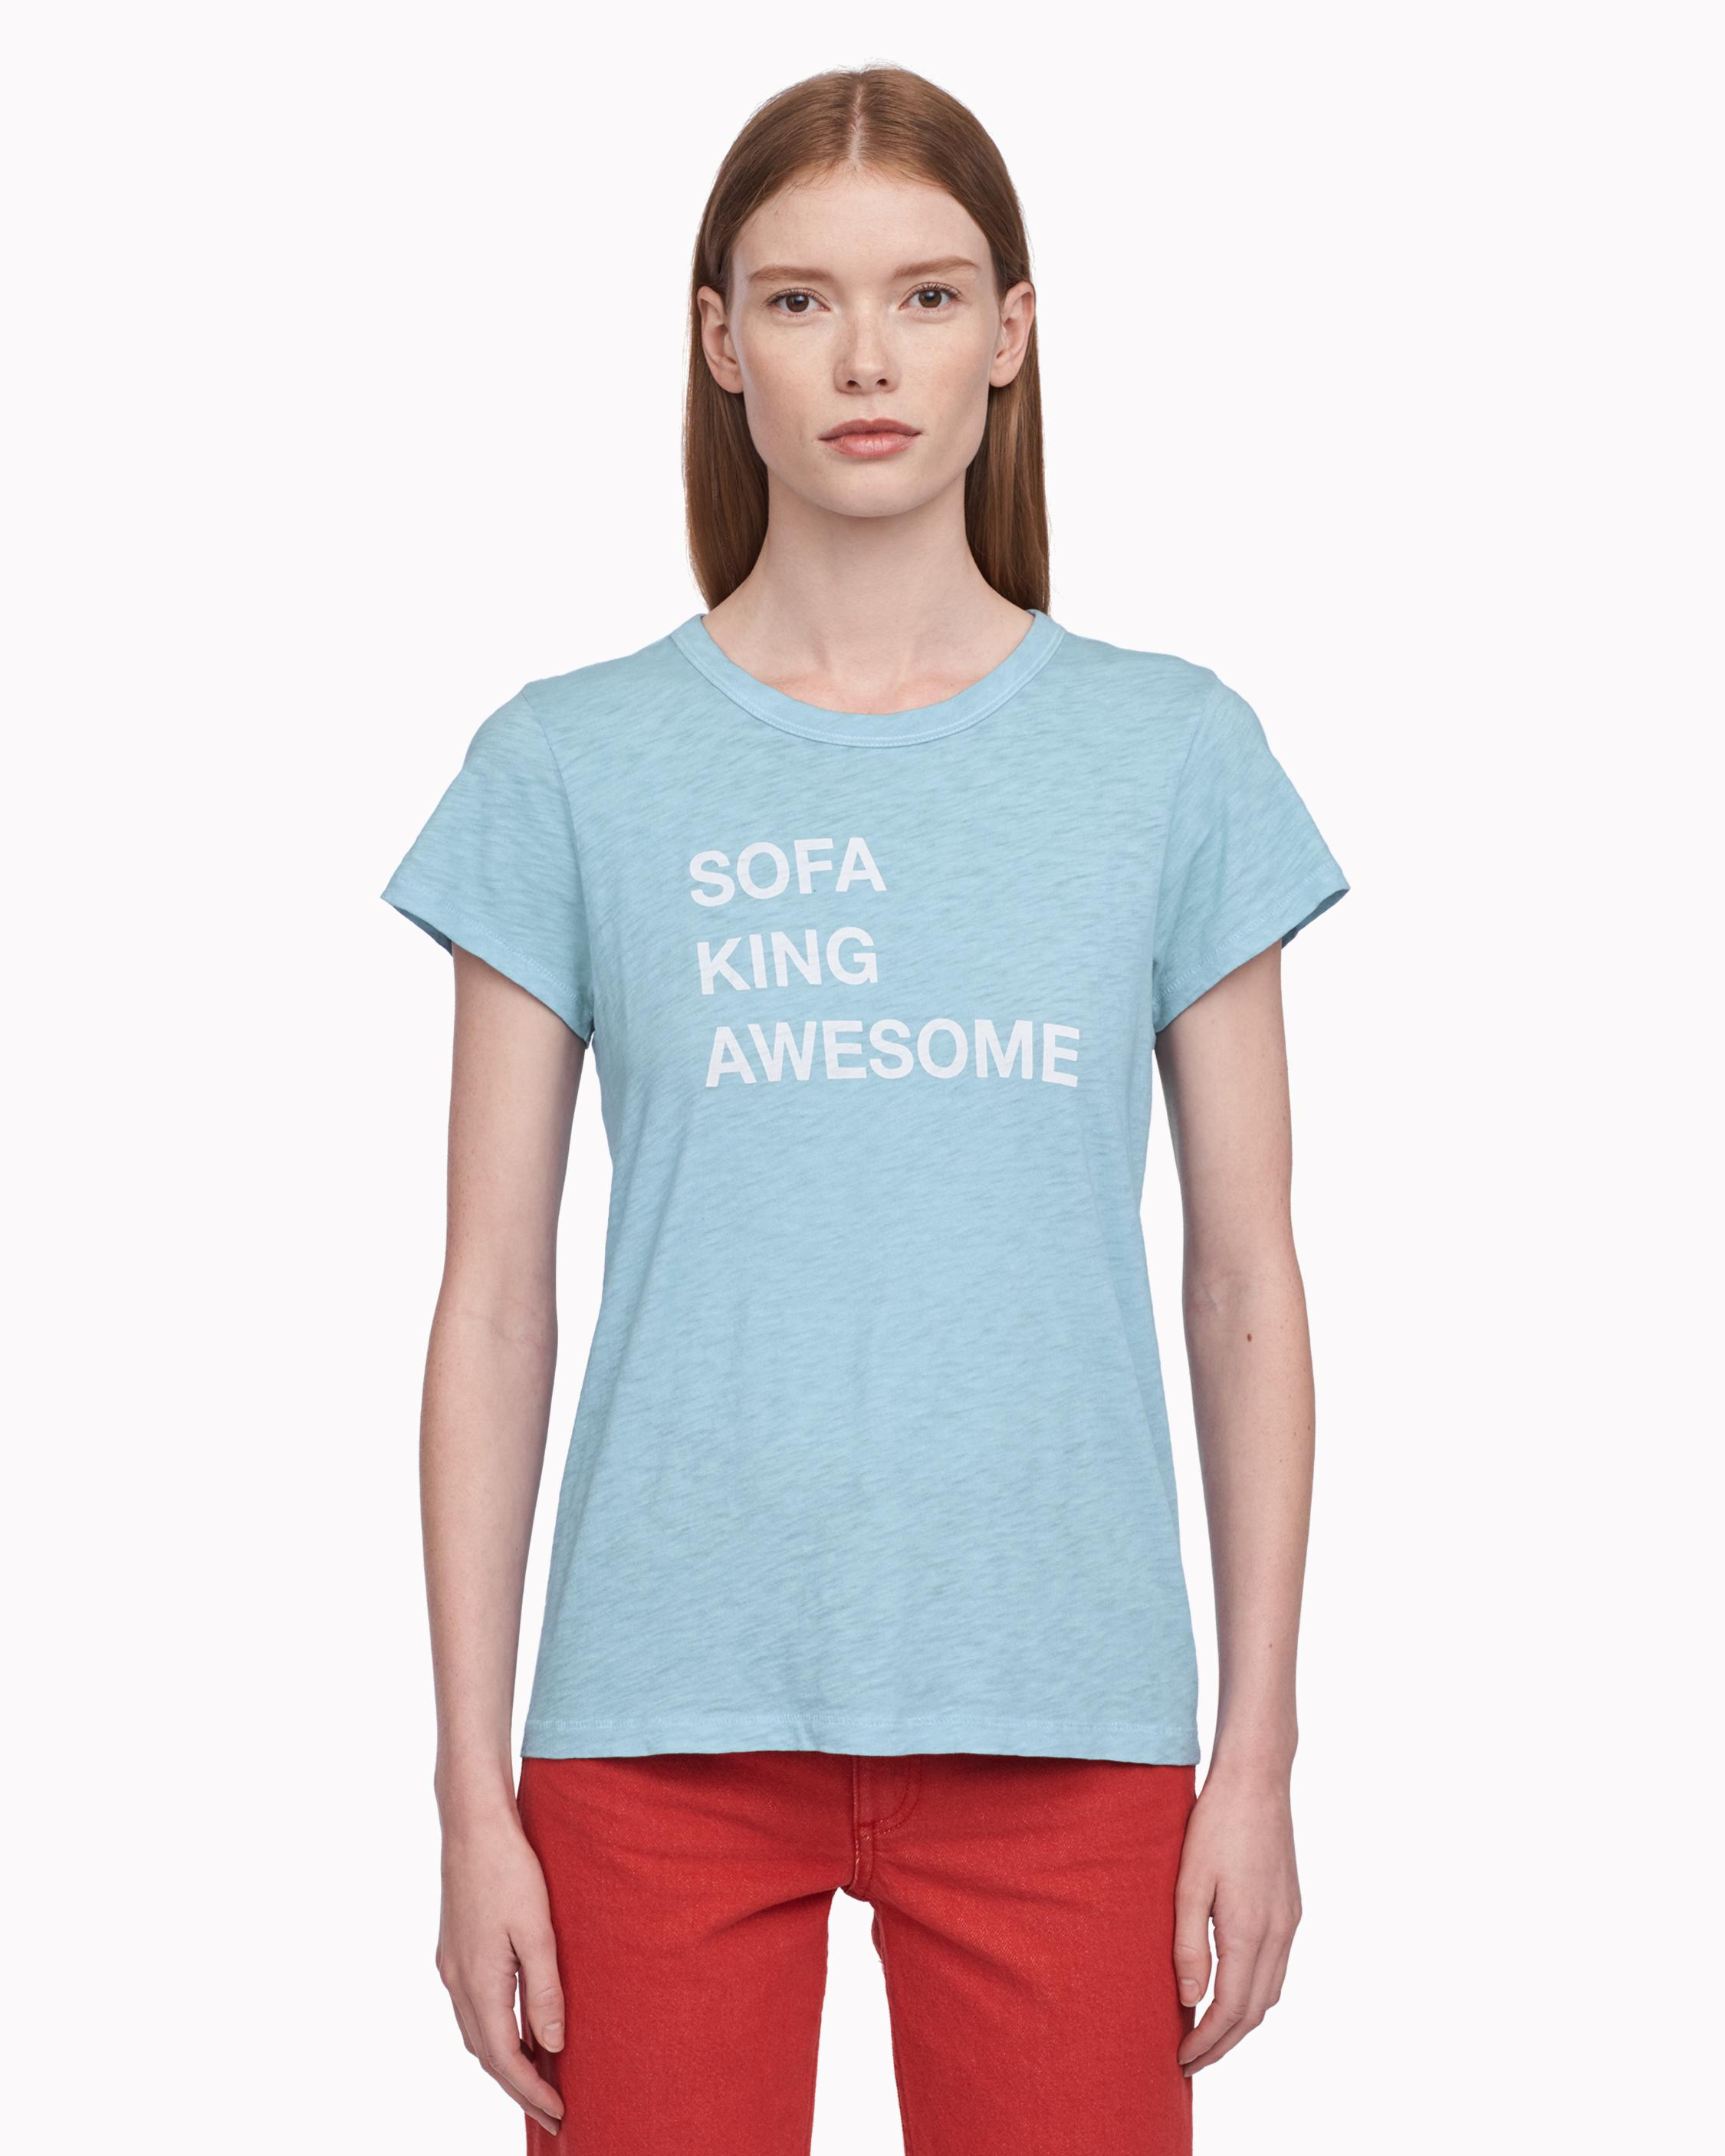 sofa king awesome t shirt tree trunk table tee women tops rag bone image description